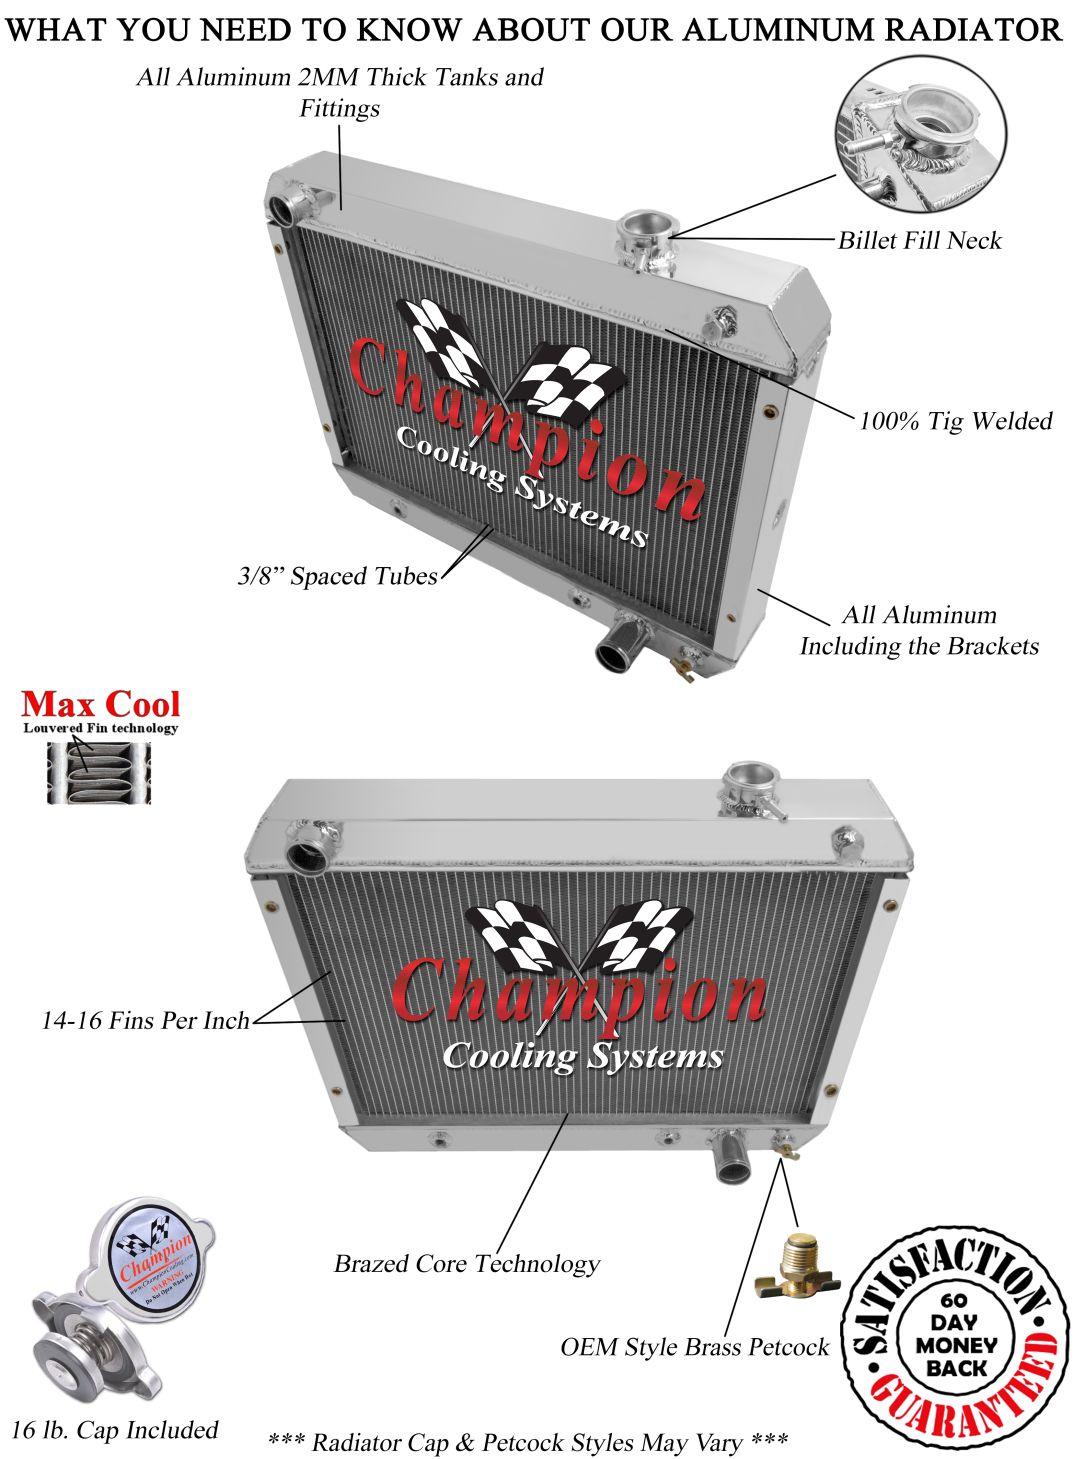 1960-62 AMC Rambler GRILL BRACKETS Champion 3 Row Aluminum Radiator CC403